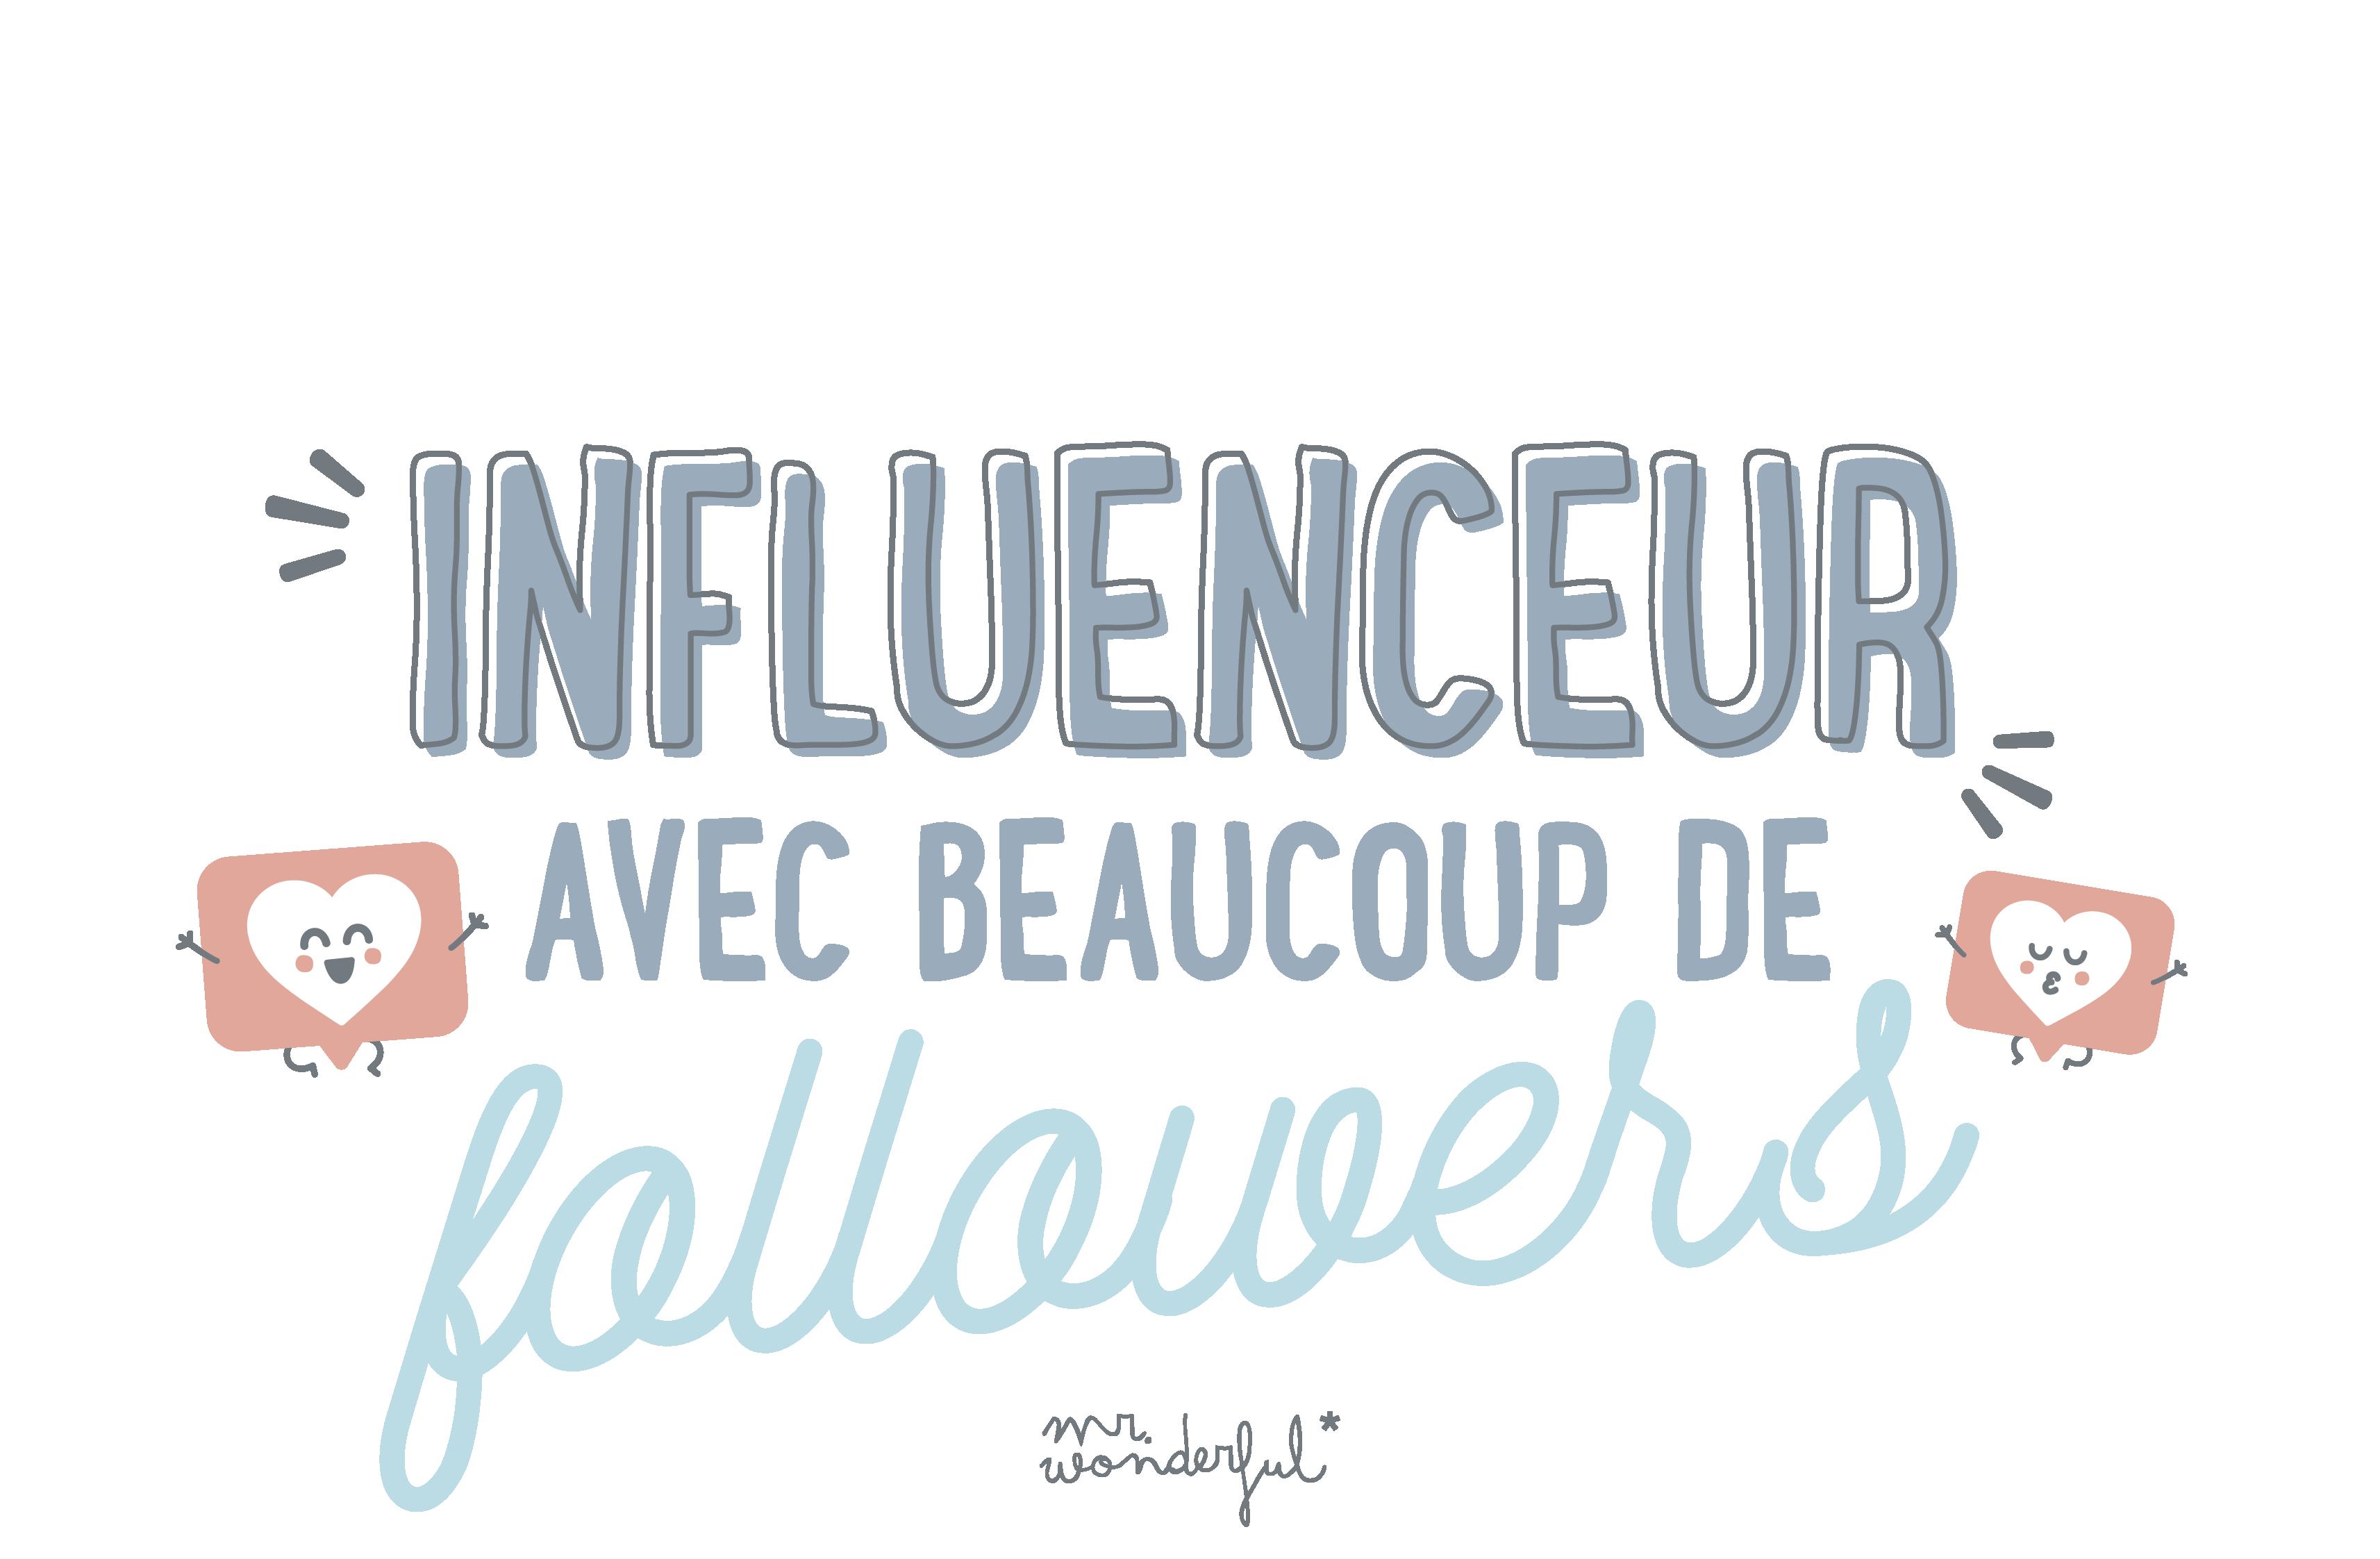 Influenceur avec beaucoup de followers